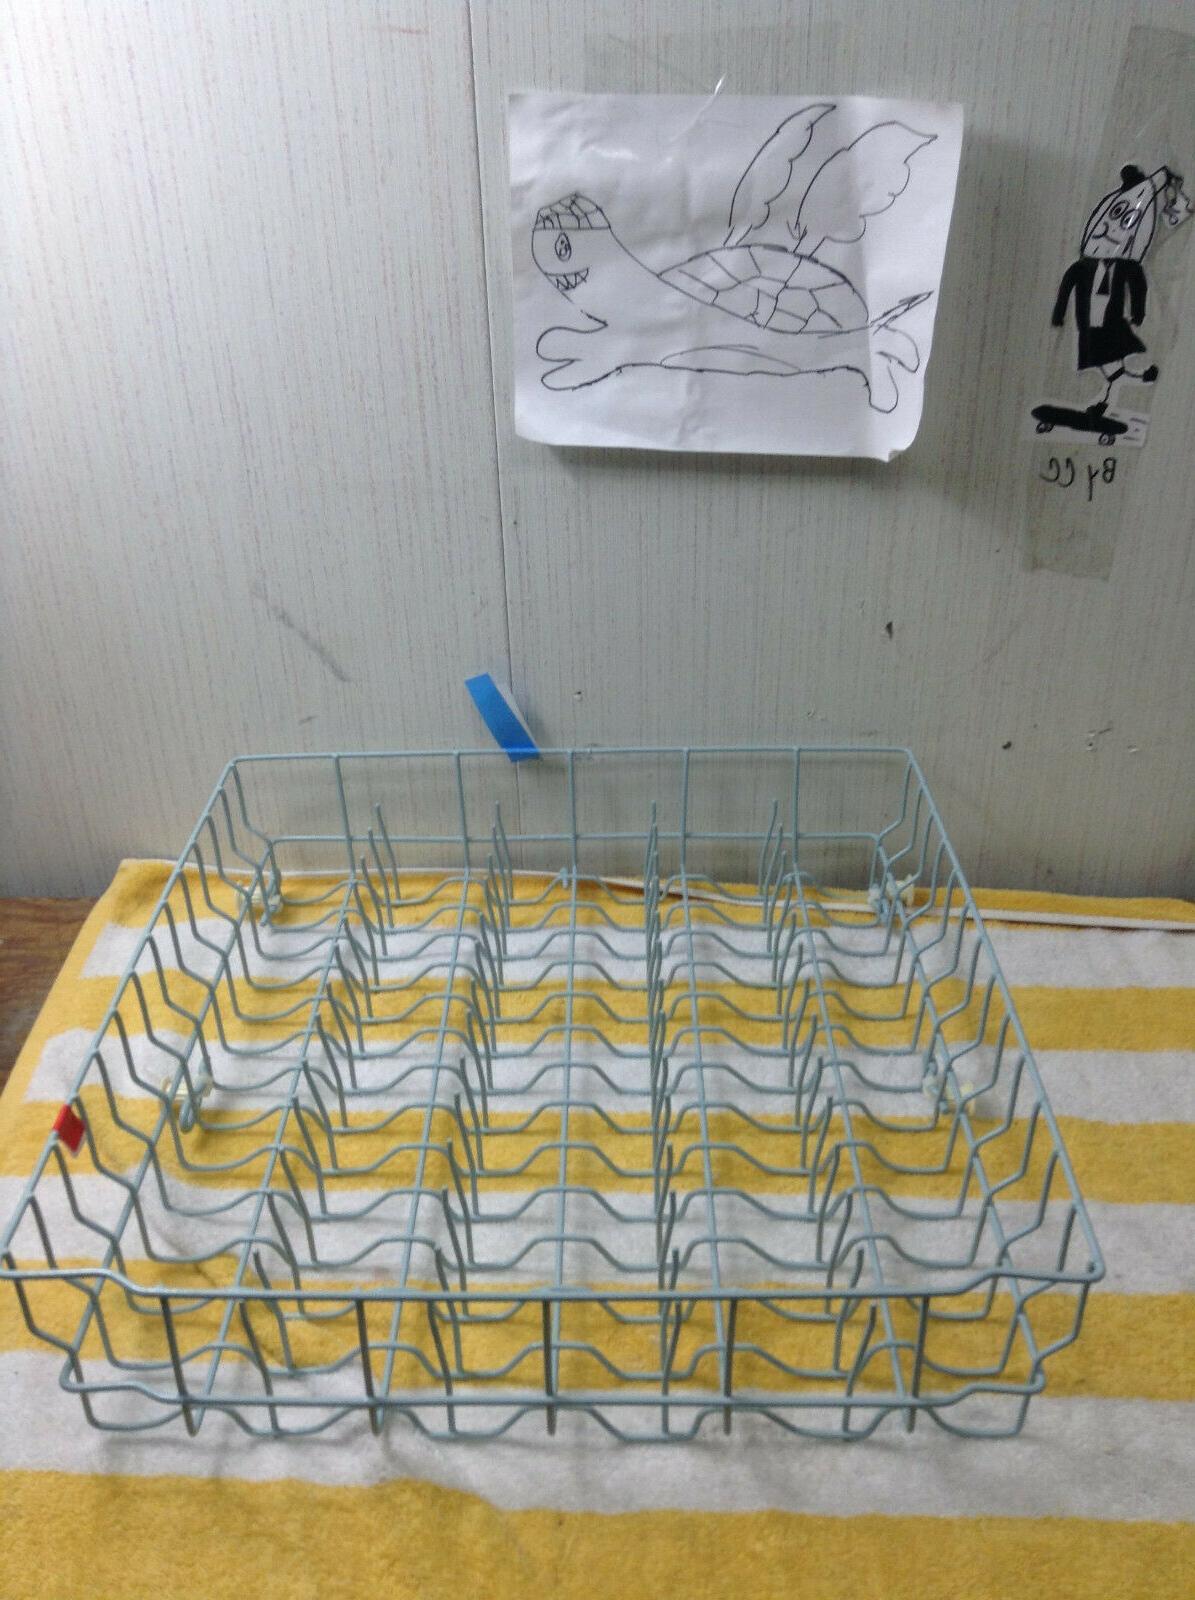 2905 0009 dishwasher upper rack free shipping